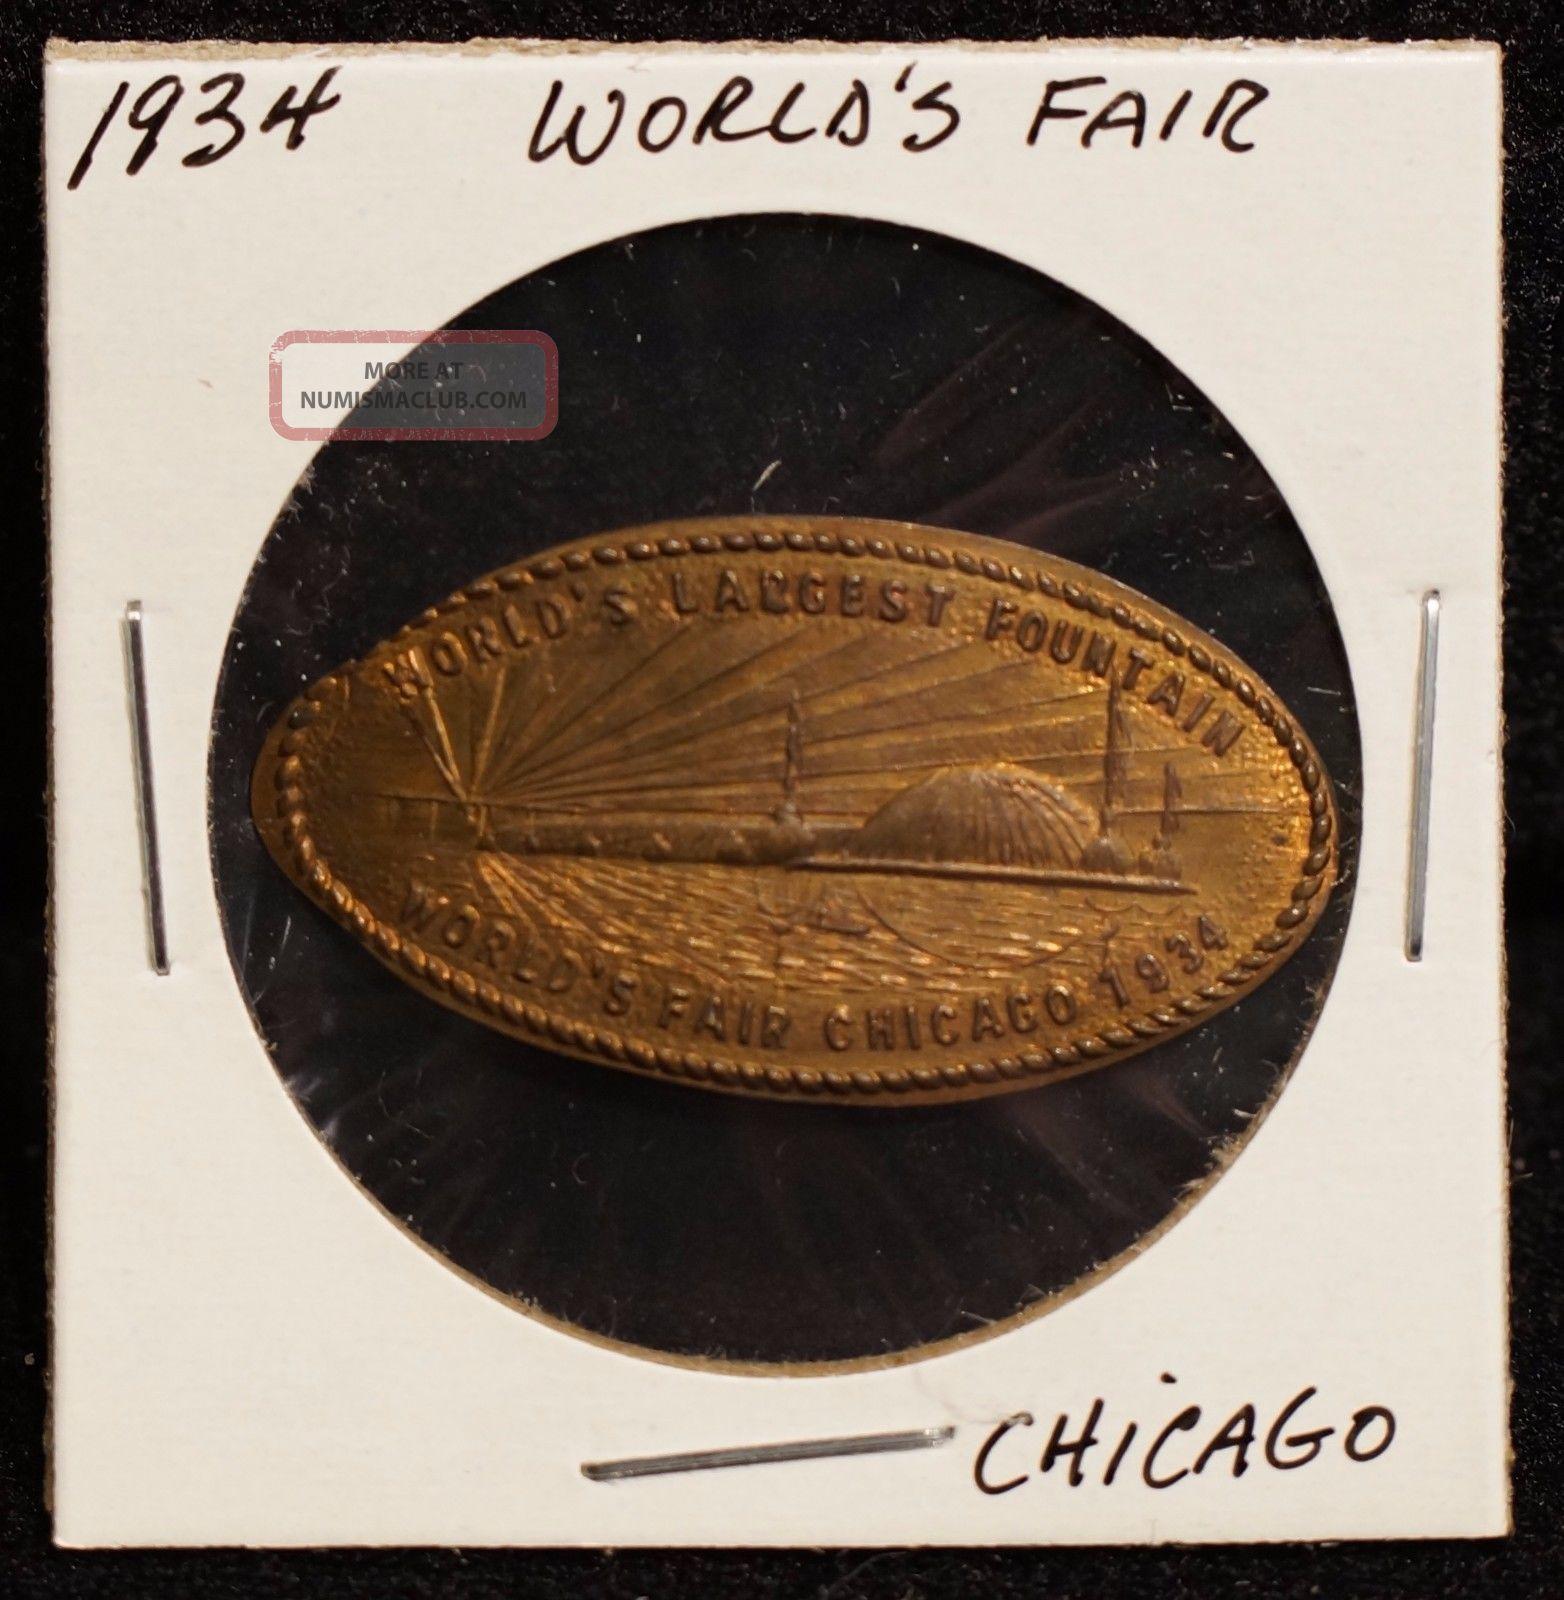 1934 World ' S Fair Chicago 1919 Lincoln Wheat Penny Elongated Souvenir Coin Exonumia photo